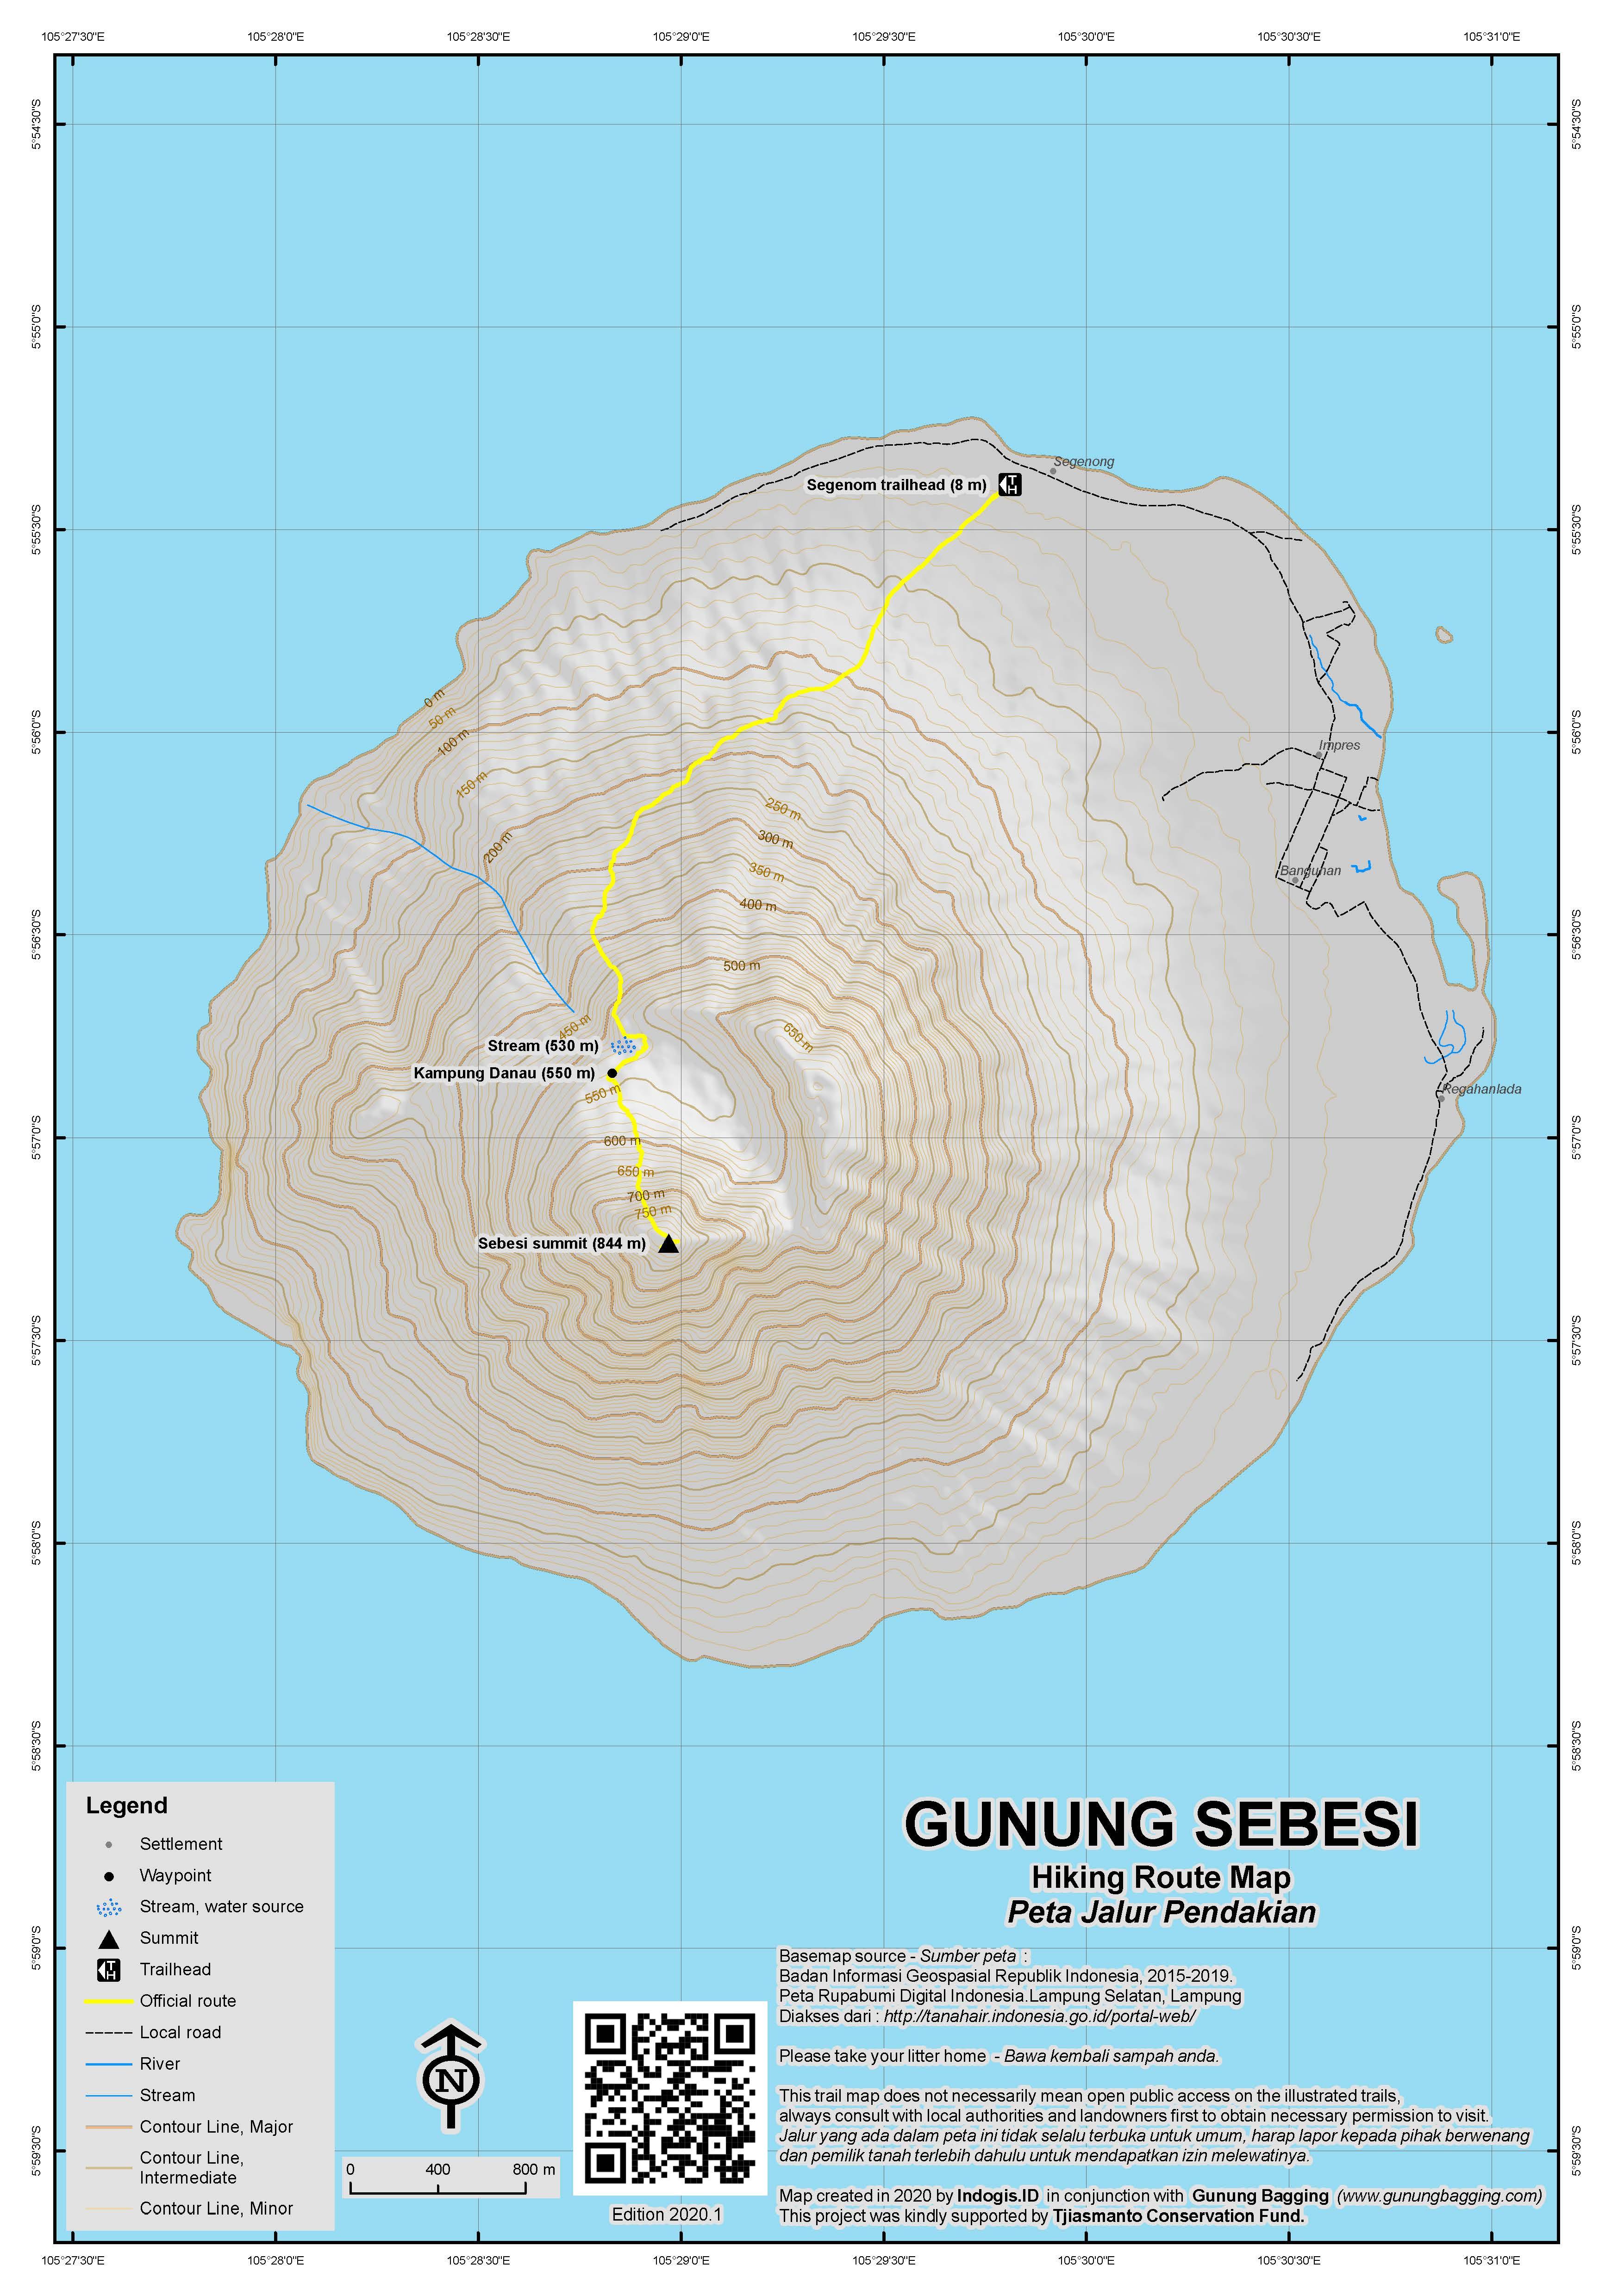 Peta Jalur Pendakian Gunung Sebesi